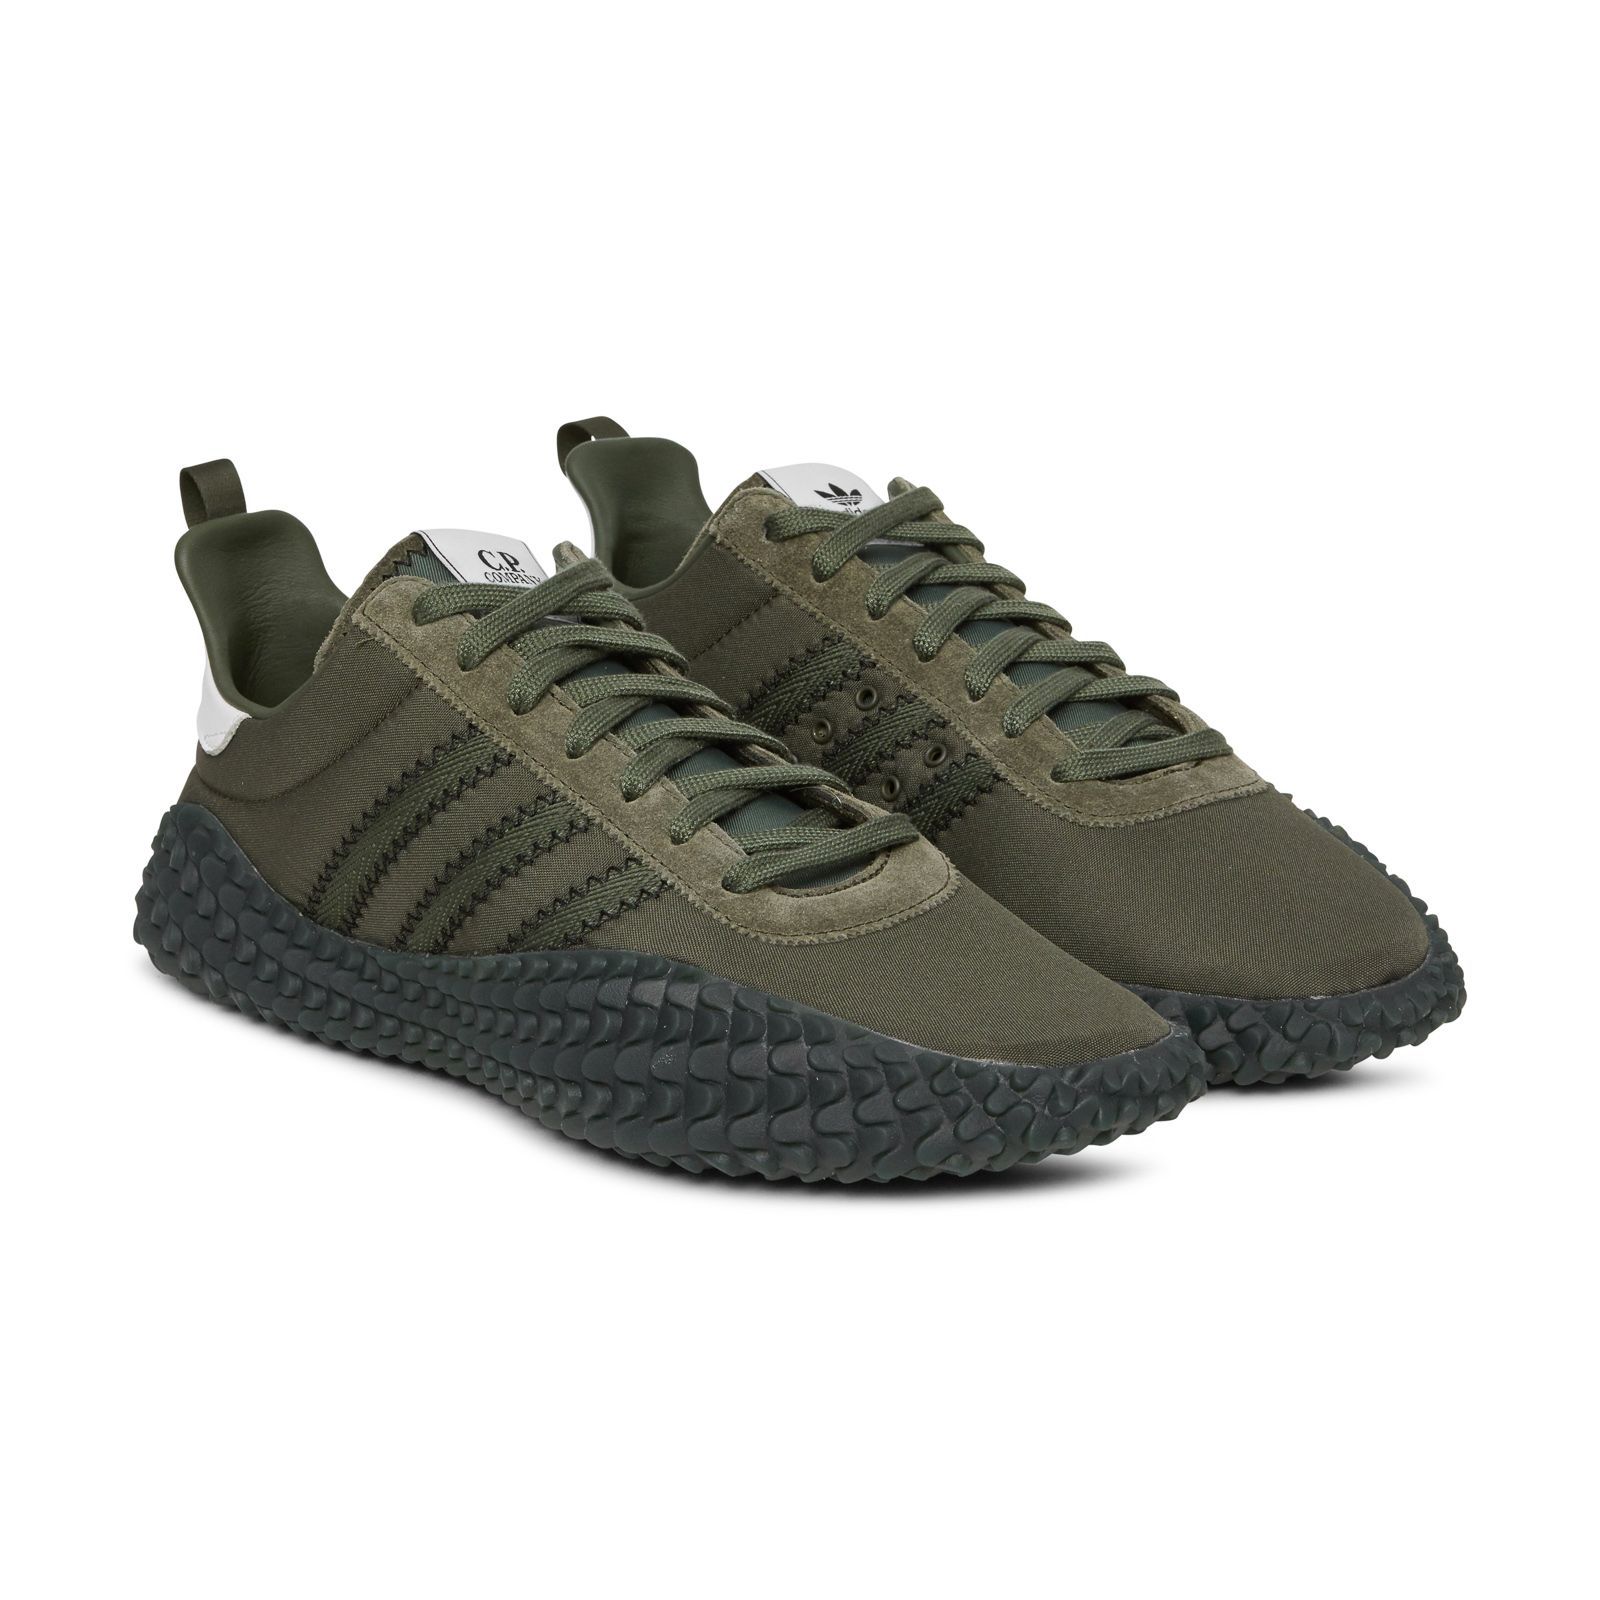 8284b9918 C.P. Company Kamanda Sneakers Shoe Websites